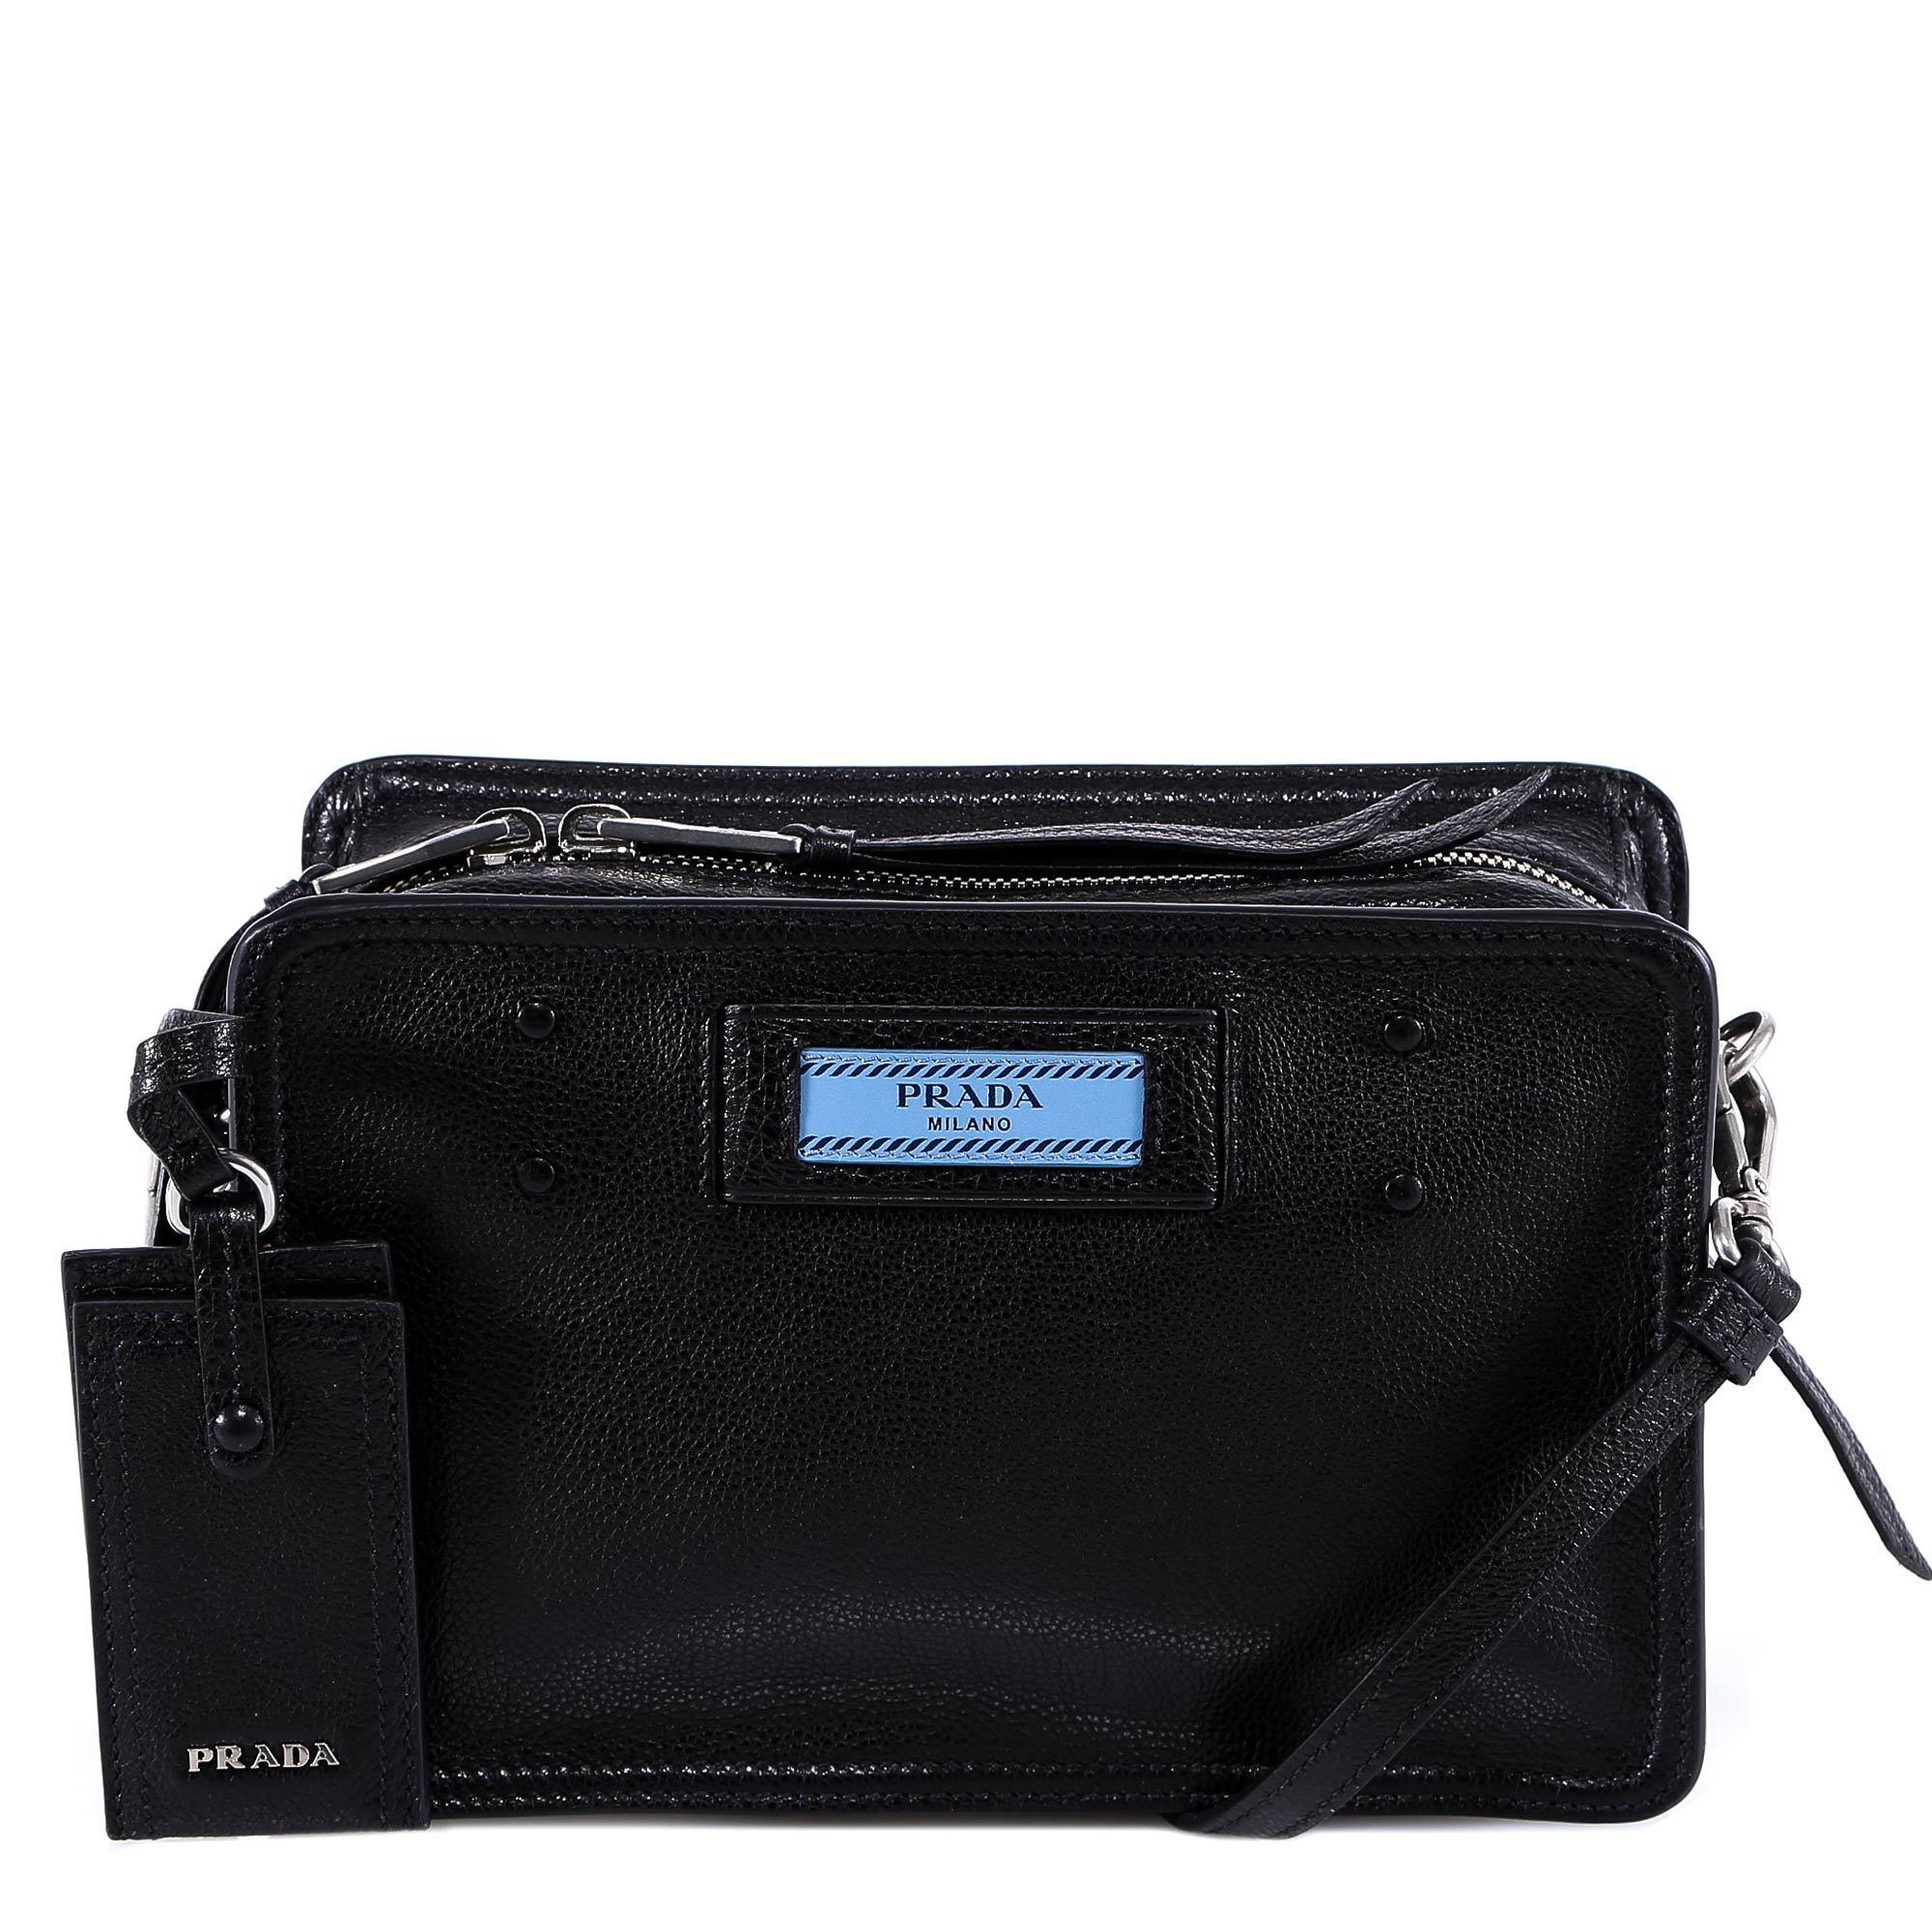 55c7466f6a6b Prada - Black Logo Shoulder Bag - Lyst. View fullscreen